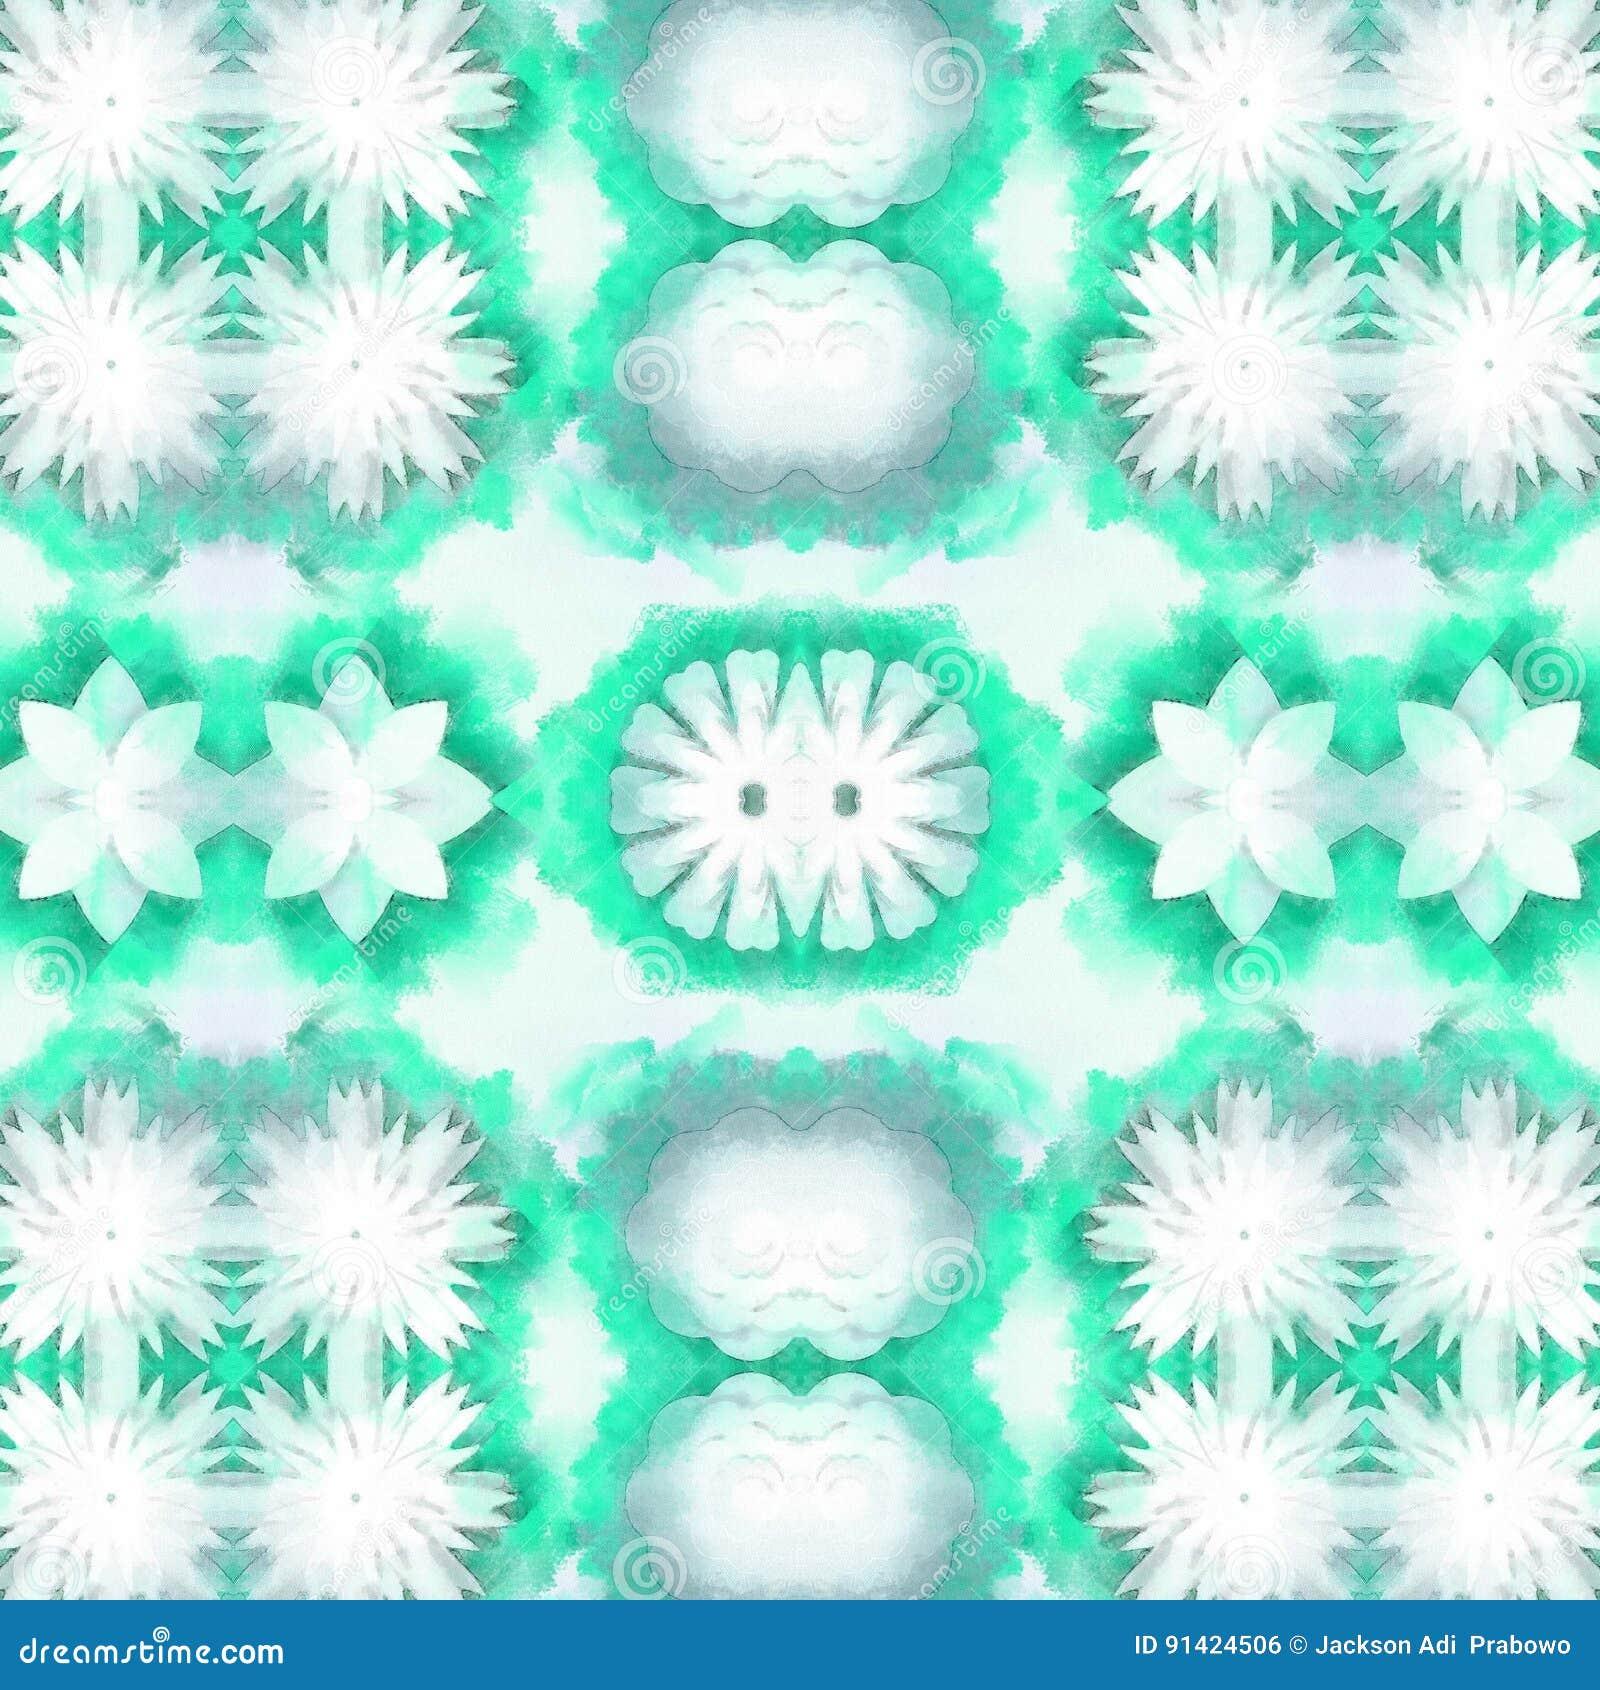 Fractal Green Nature